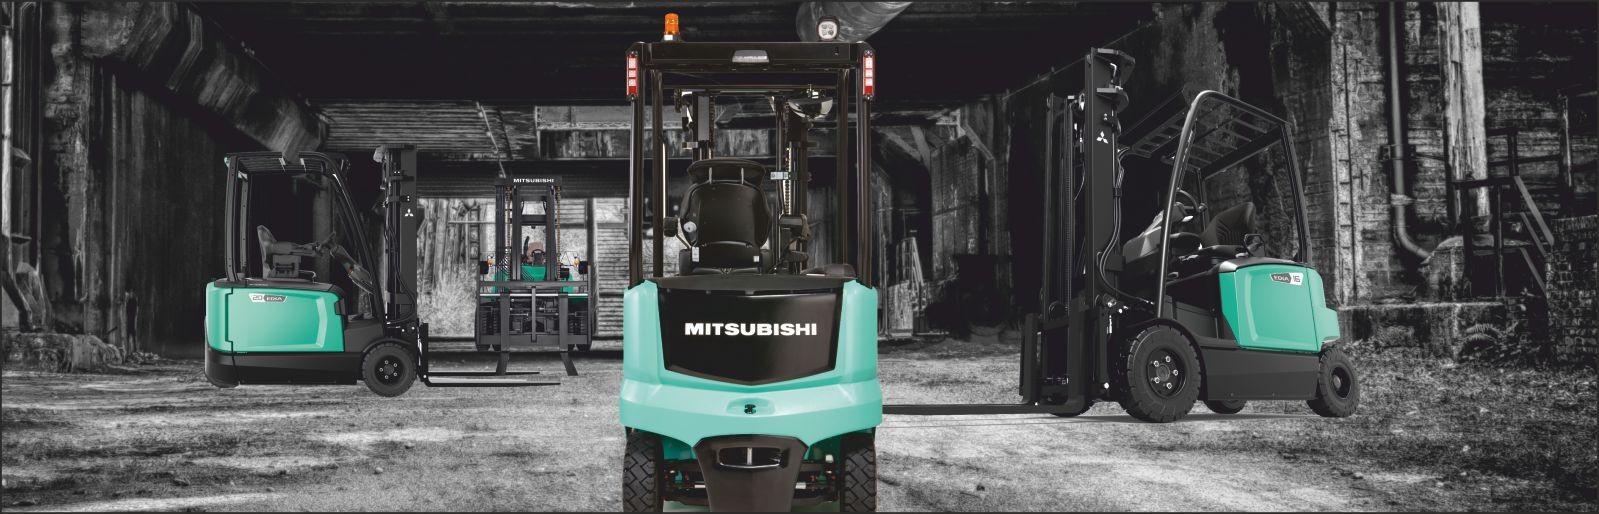 Mitsubishi Gabelstapler Senden